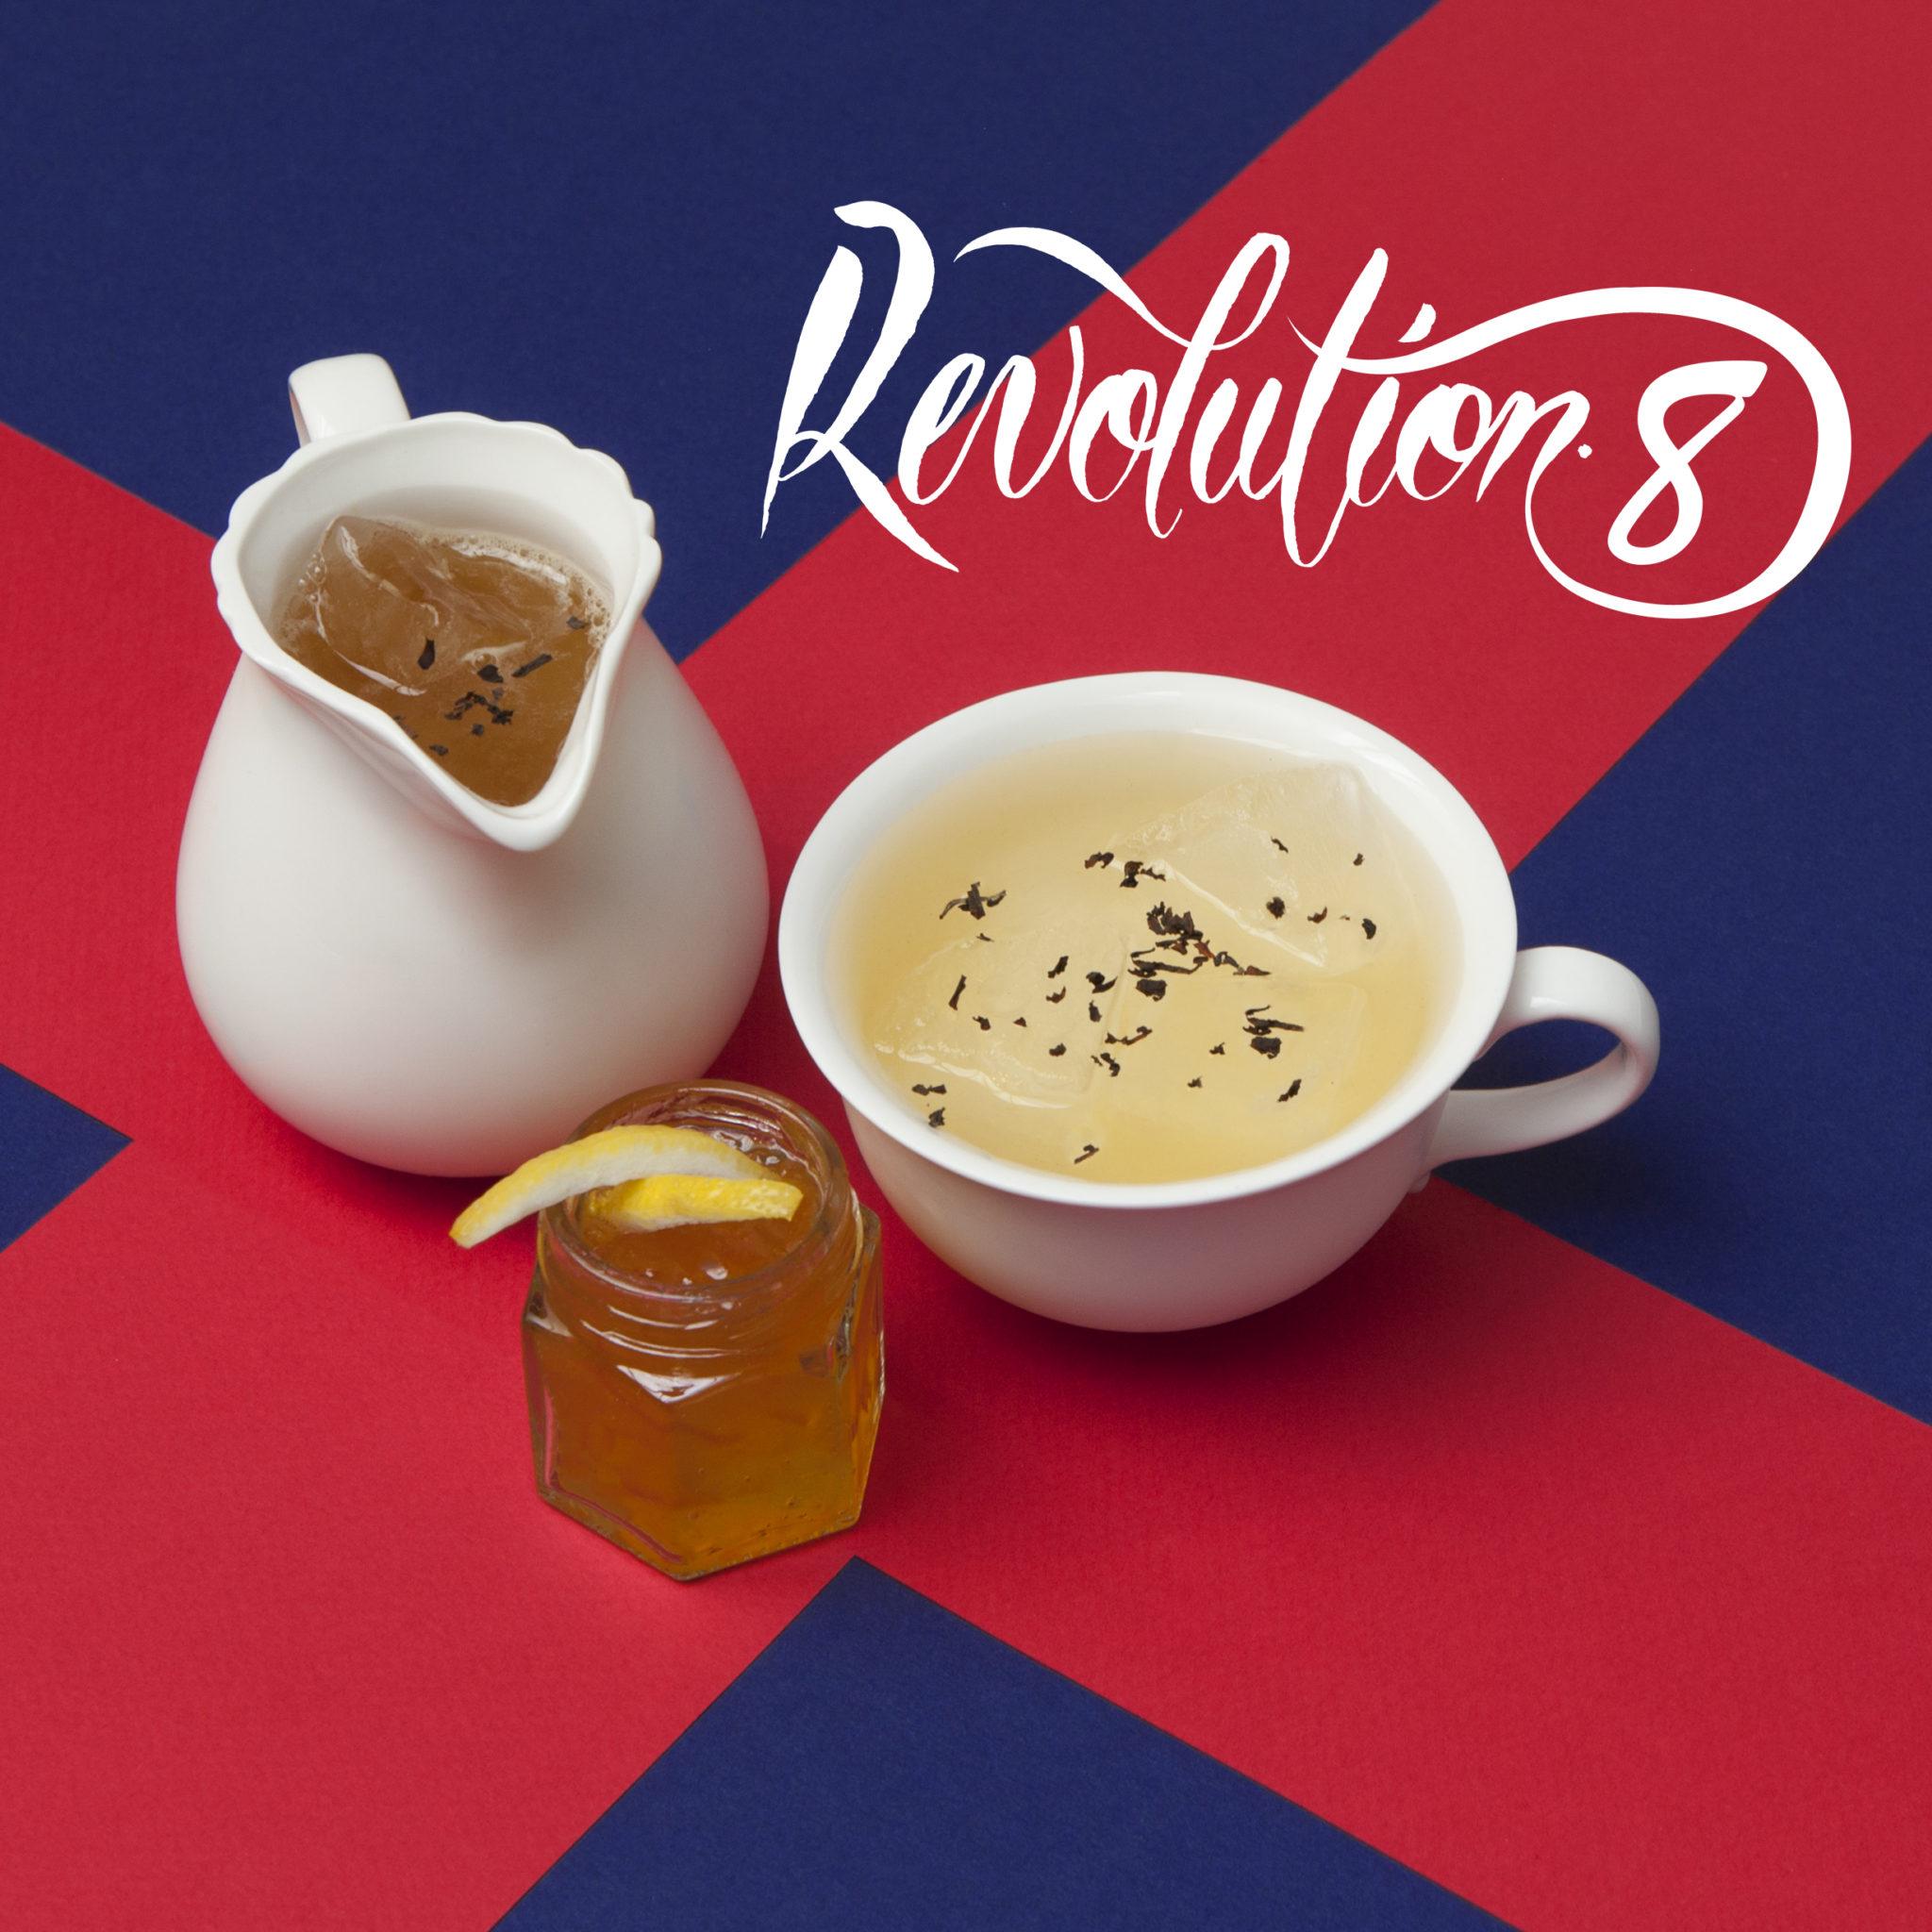 REVOLUTION-8_TYPO